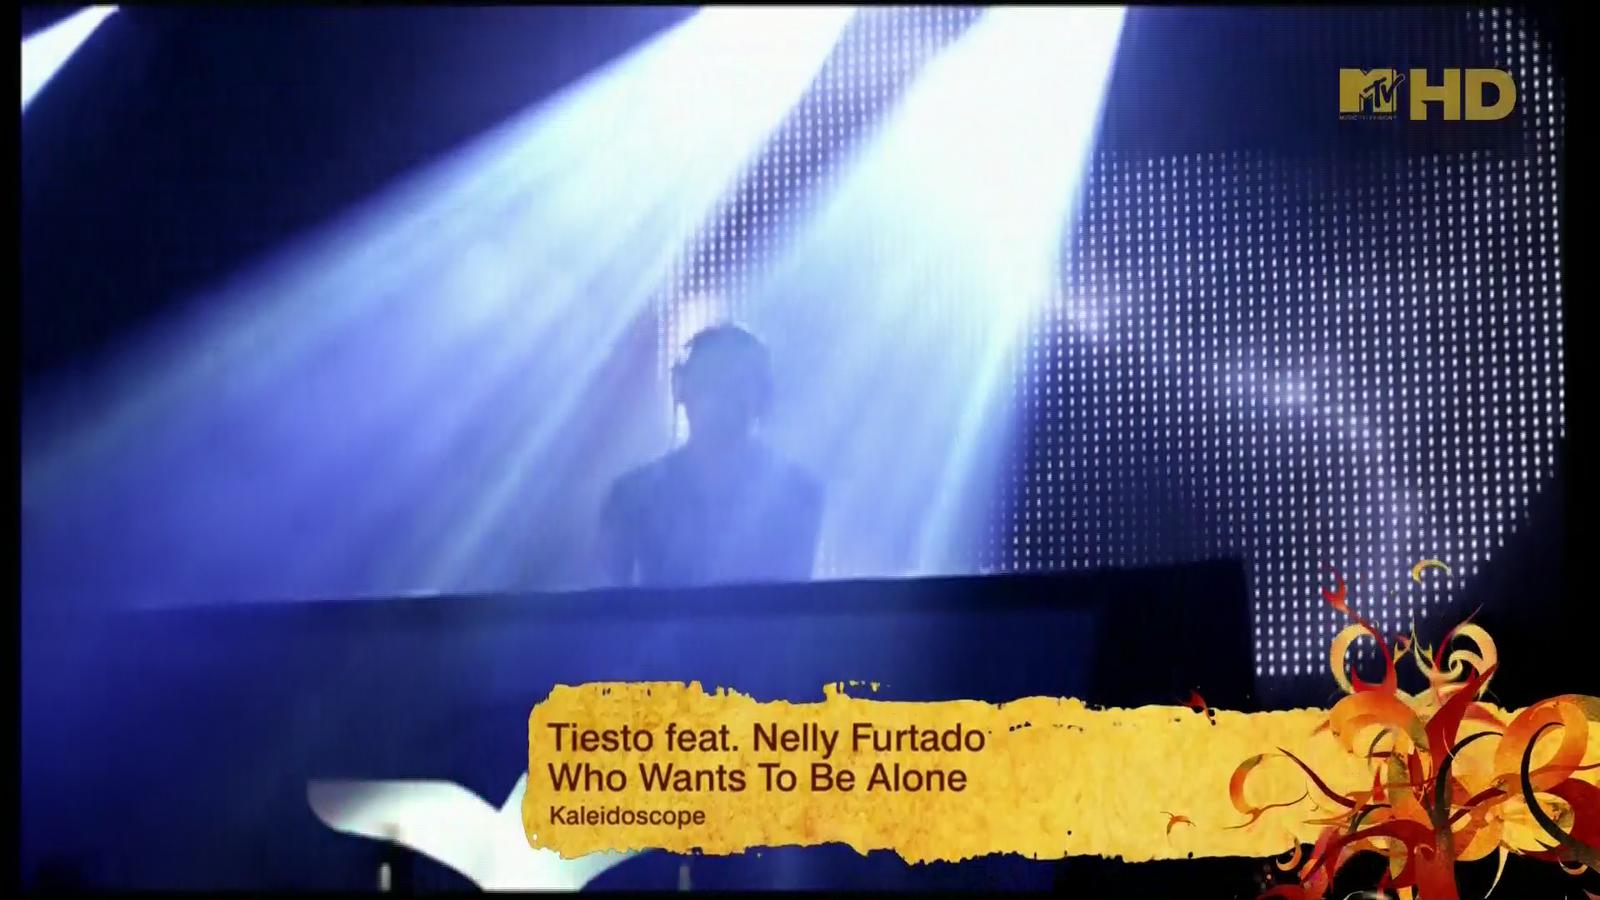 http://1.bp.blogspot.com/-t-B2rLalSp0/TZTogeX3S4I/AAAAAAAACvw/VOFN4rLPMhM/s1600/Captura-Tiesto+feat.+Nelly+Furtado+-+Who+Wants+To+Be+Alone.ts-2.png